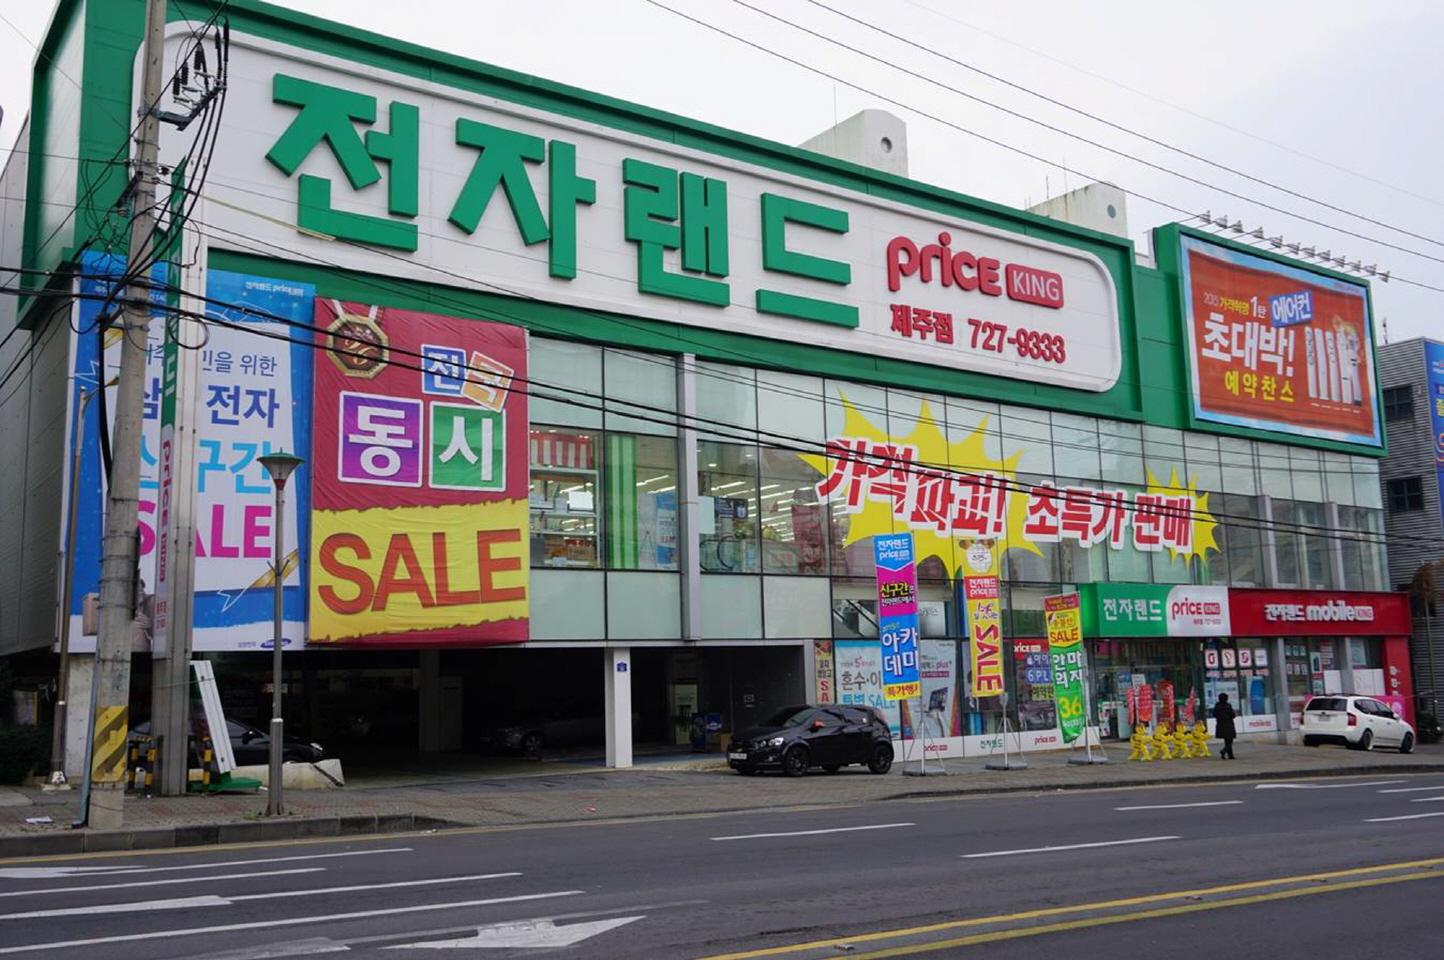 ET Land Price King – Jeju Branch (전자랜드 프라이스킹 (제주점))